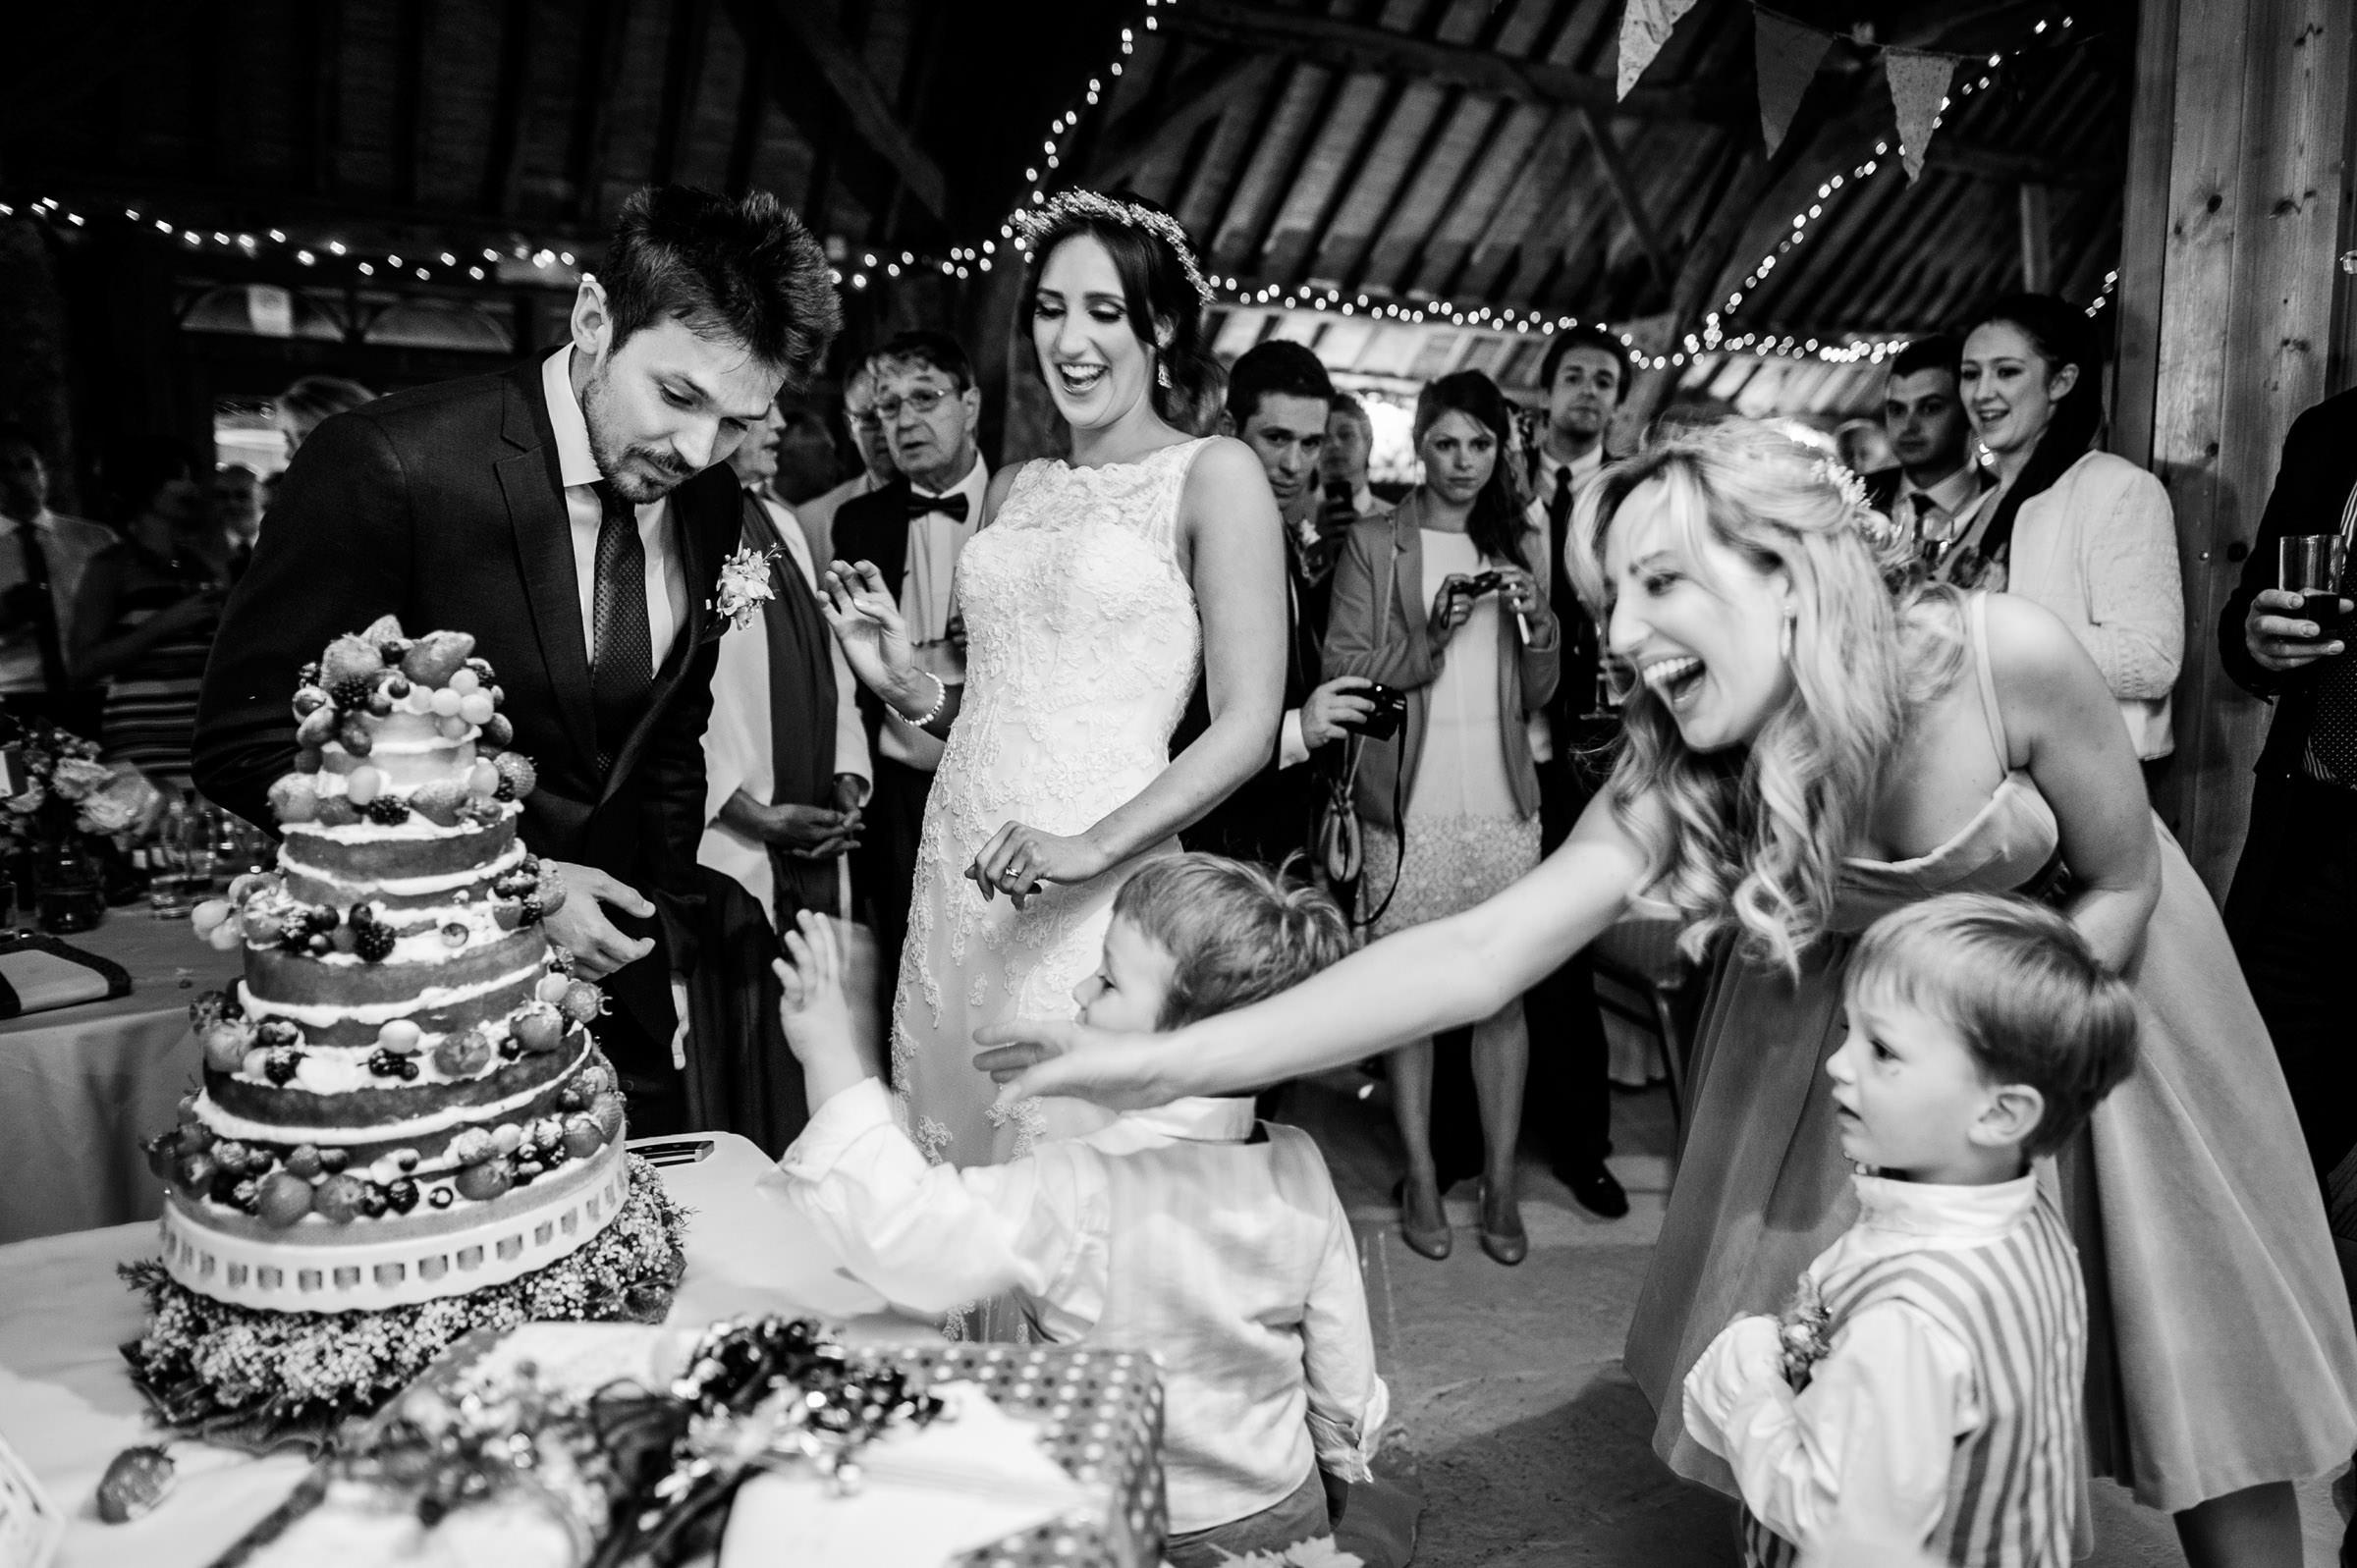 Notley Tythe Barn Reportage Wedding Photos 037.jpg